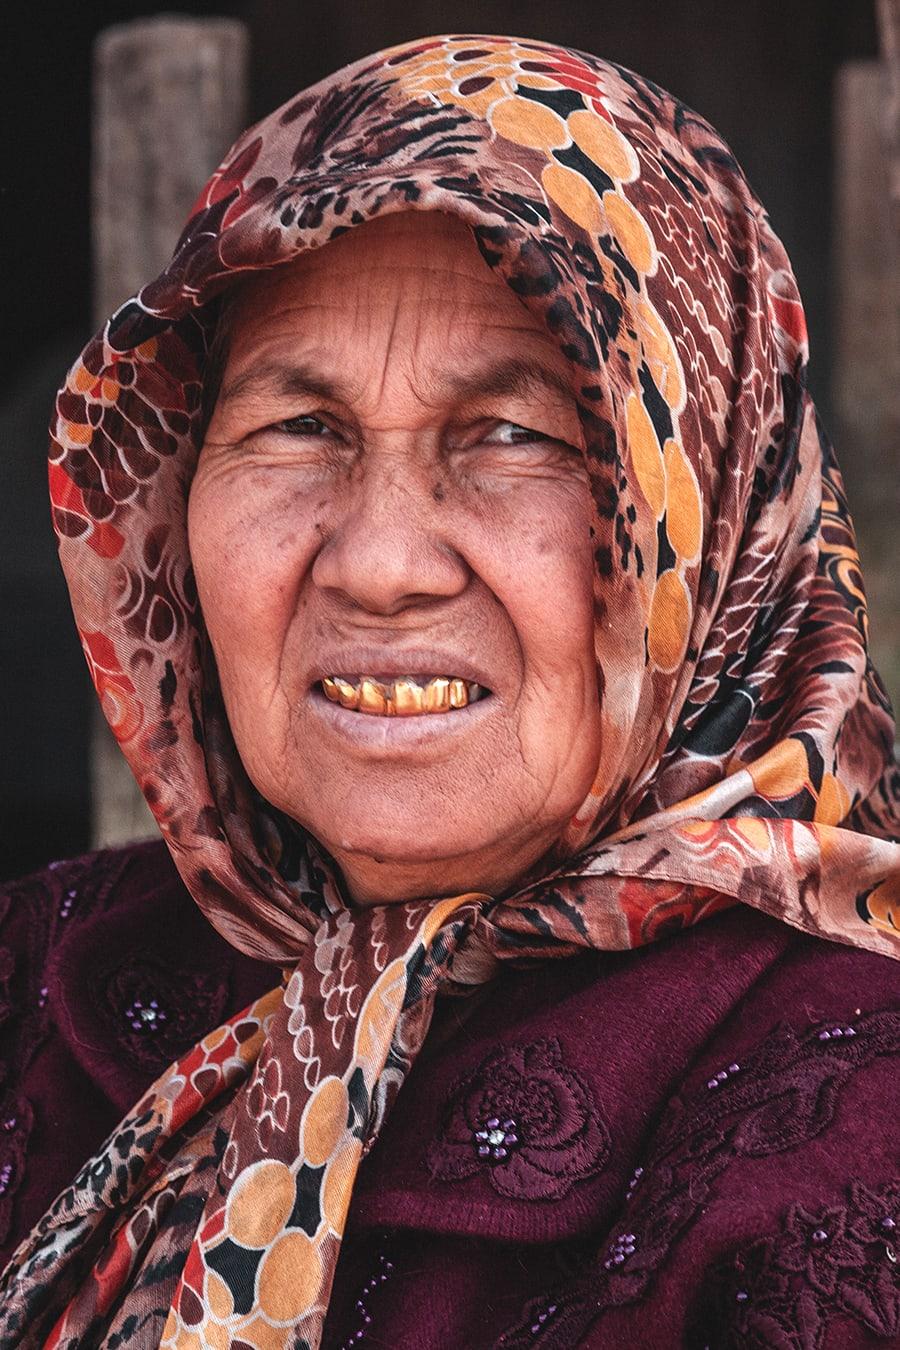 Woman at the Yekshenba Livestock market in Kashgar, China.